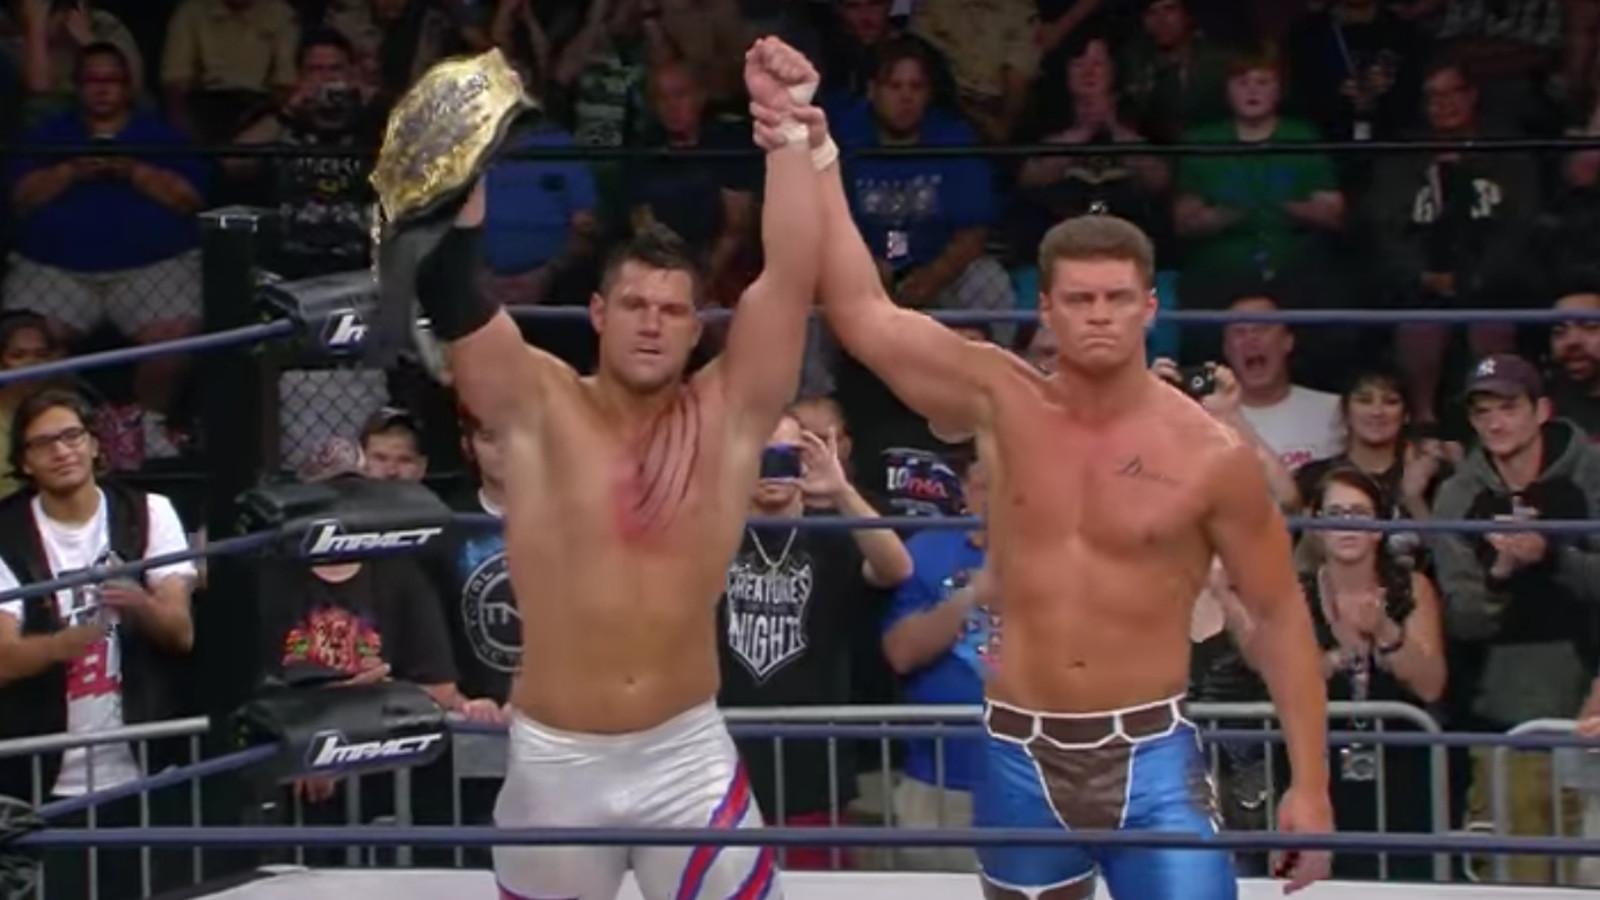 TNA Impact ratings bounce back